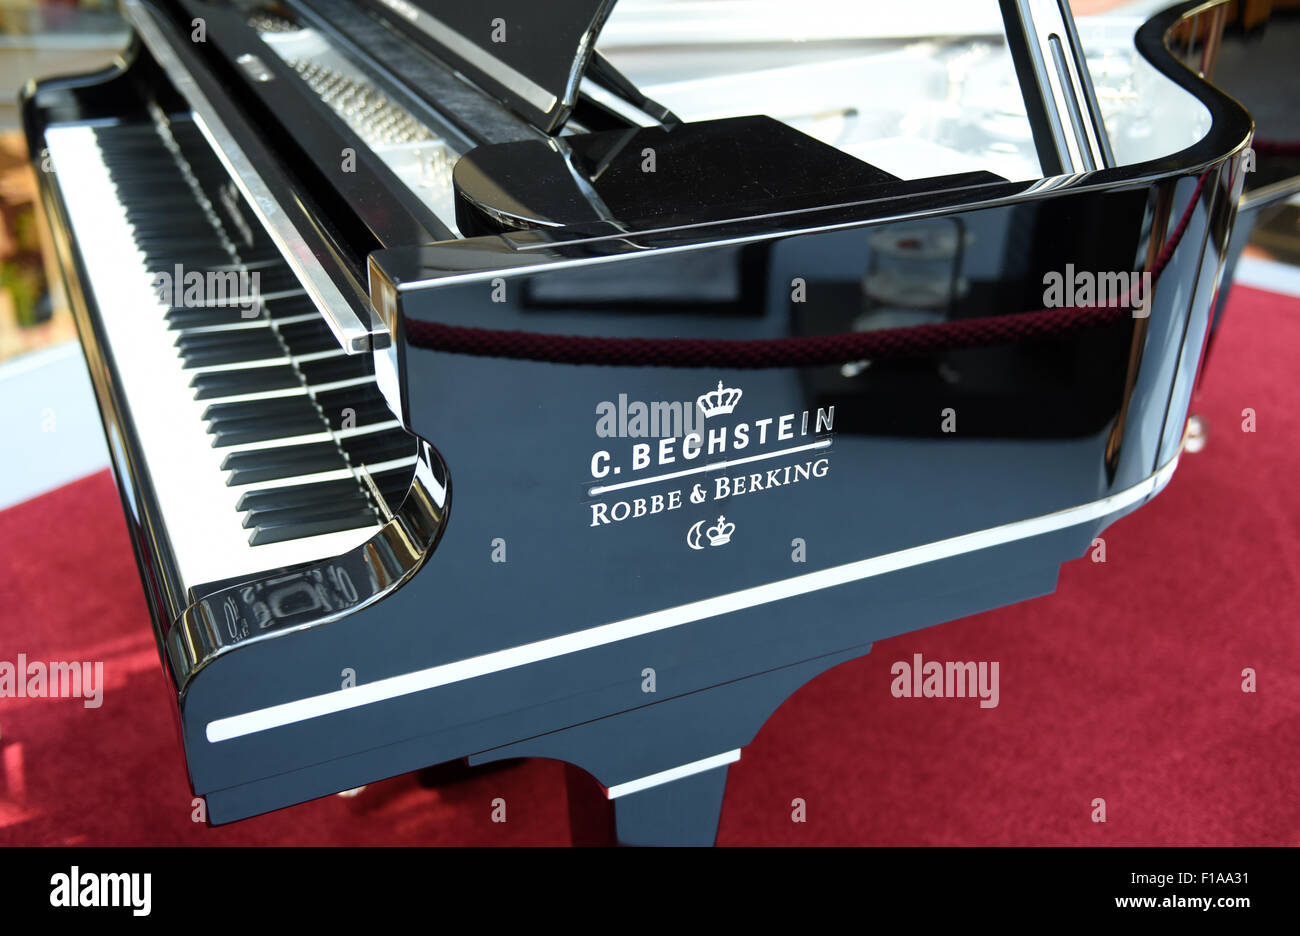 The silver grand piano 'Carl Bechstein Sterling Grand Piano